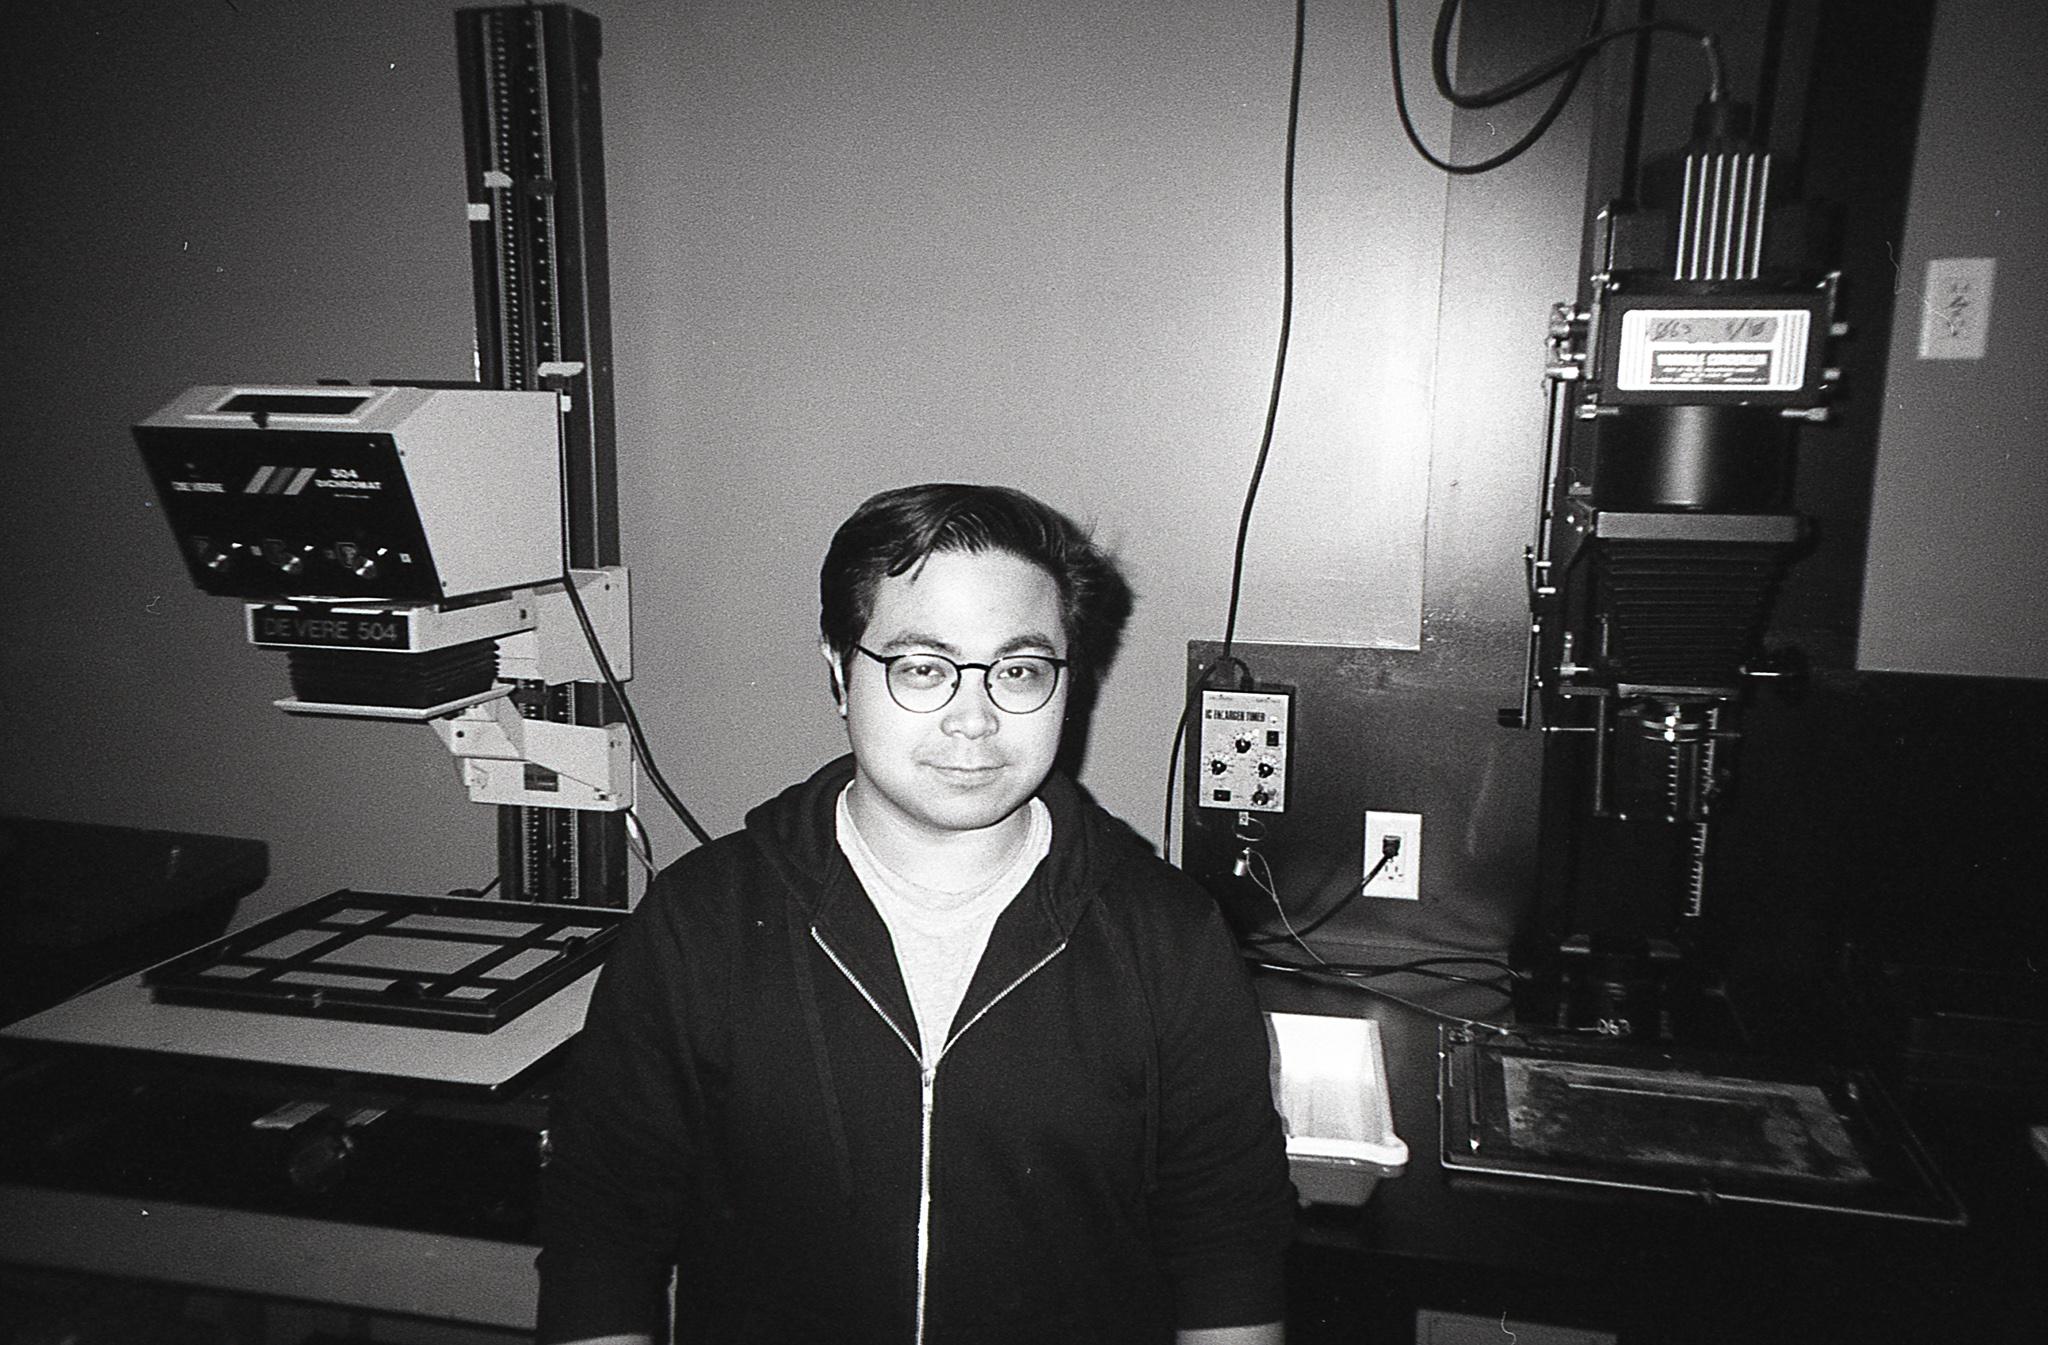 Me captured by Hongen - Kodak Tri-X 400